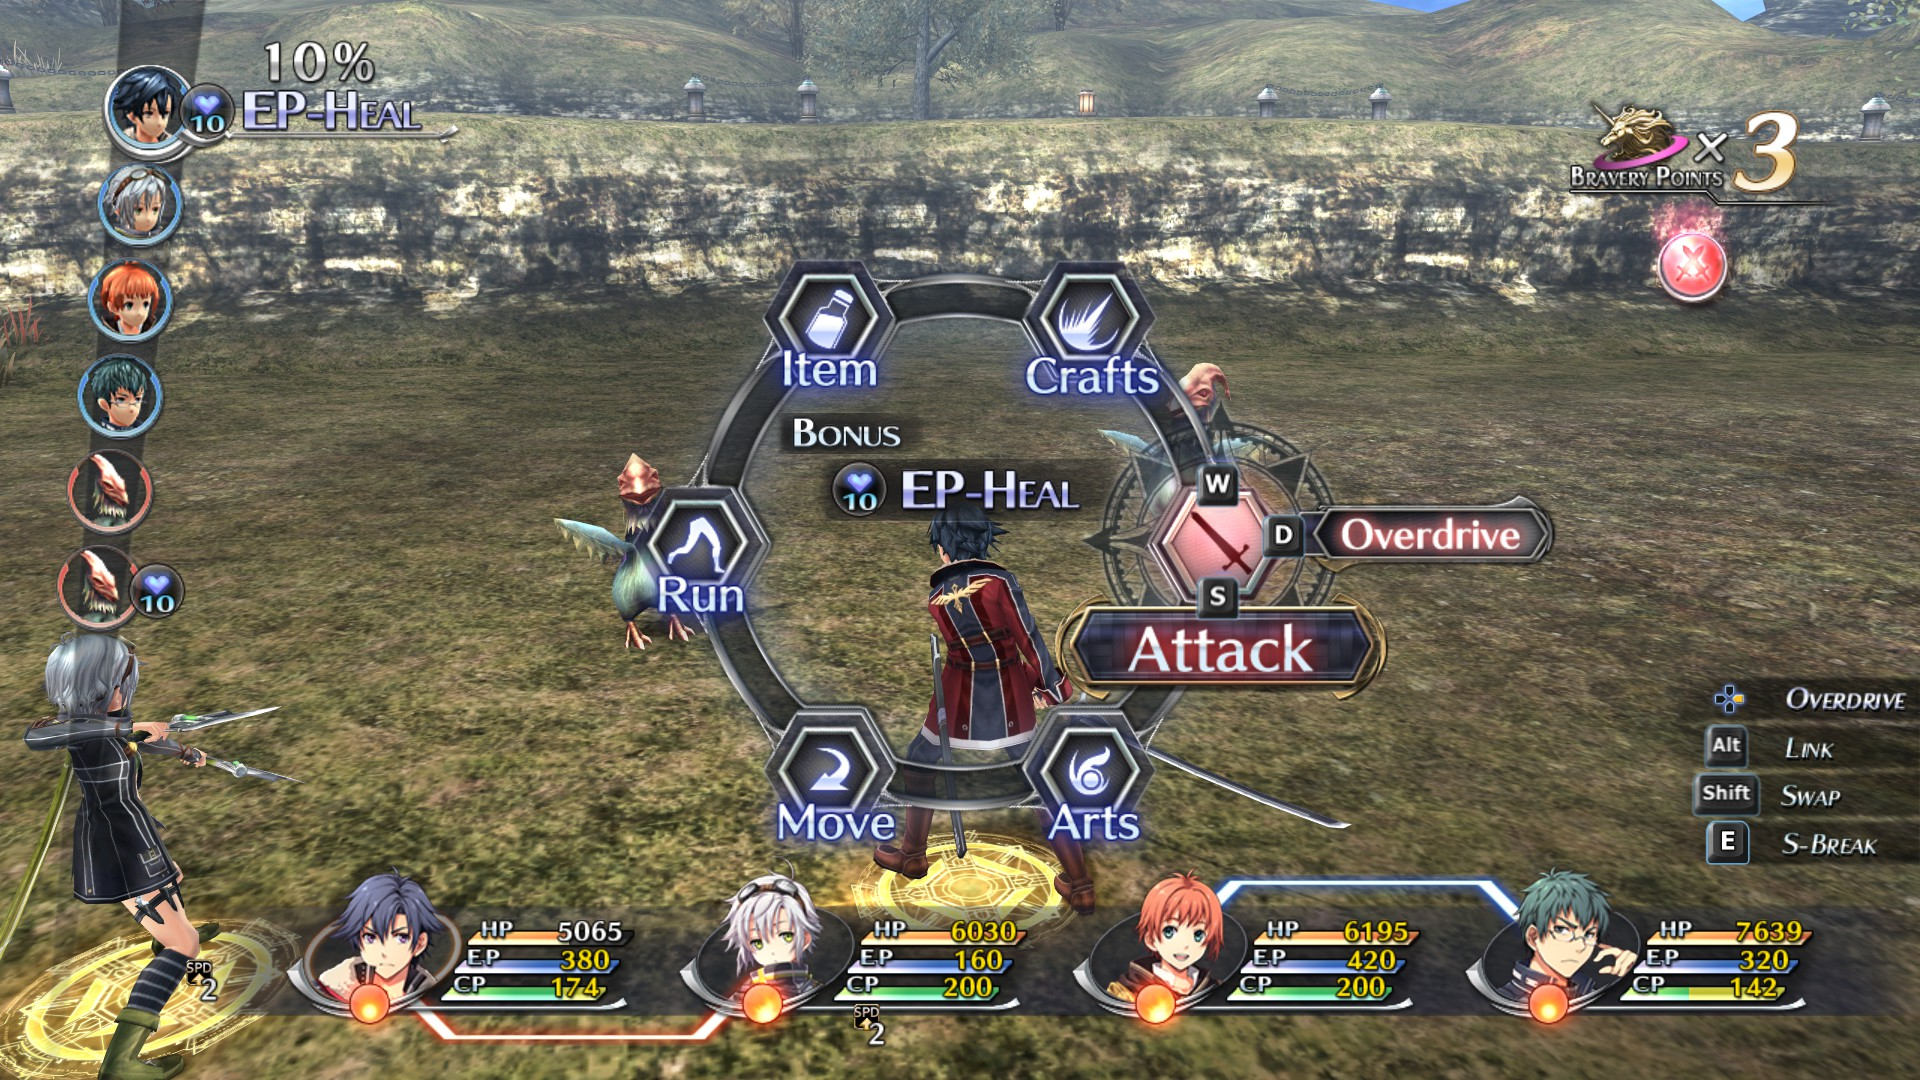 The-Legend-of-Heroes-Trails-of-Cold-steel-II-Screenshot-02.jpg